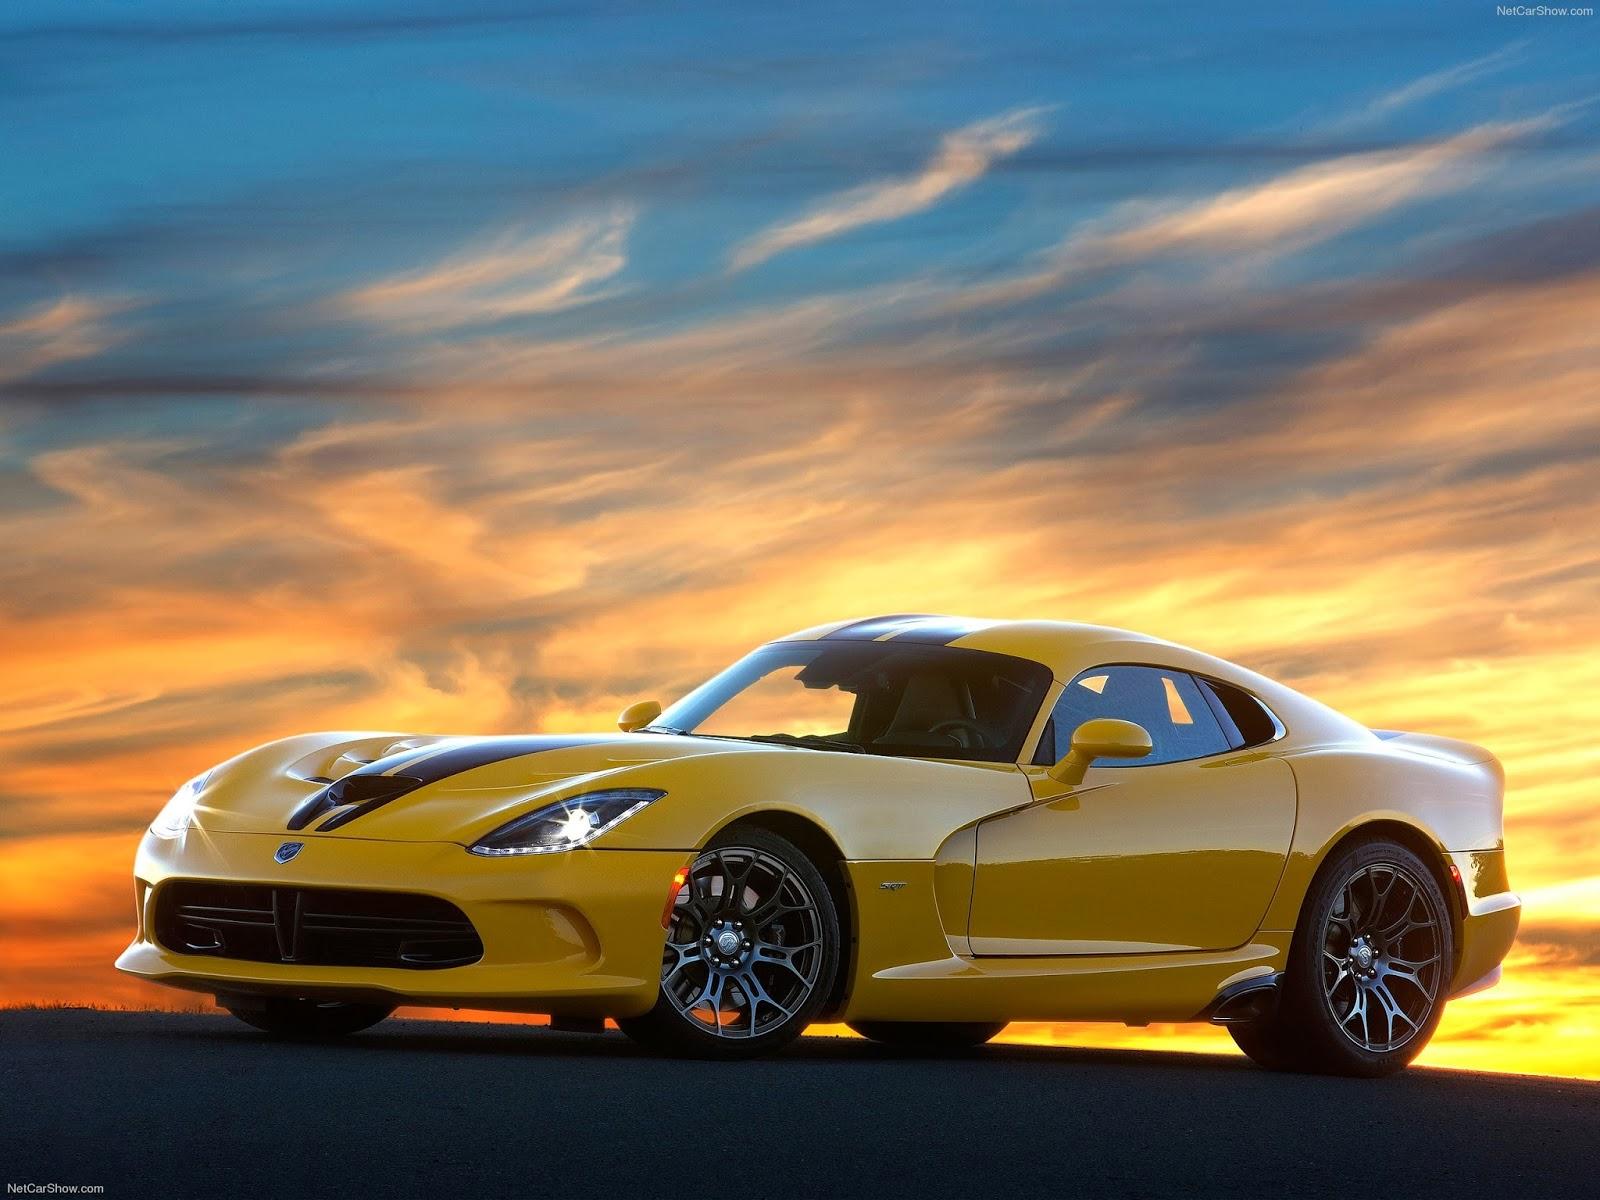 HD Wallpapers: Dodge SRT Viper 2013 Wallpapers